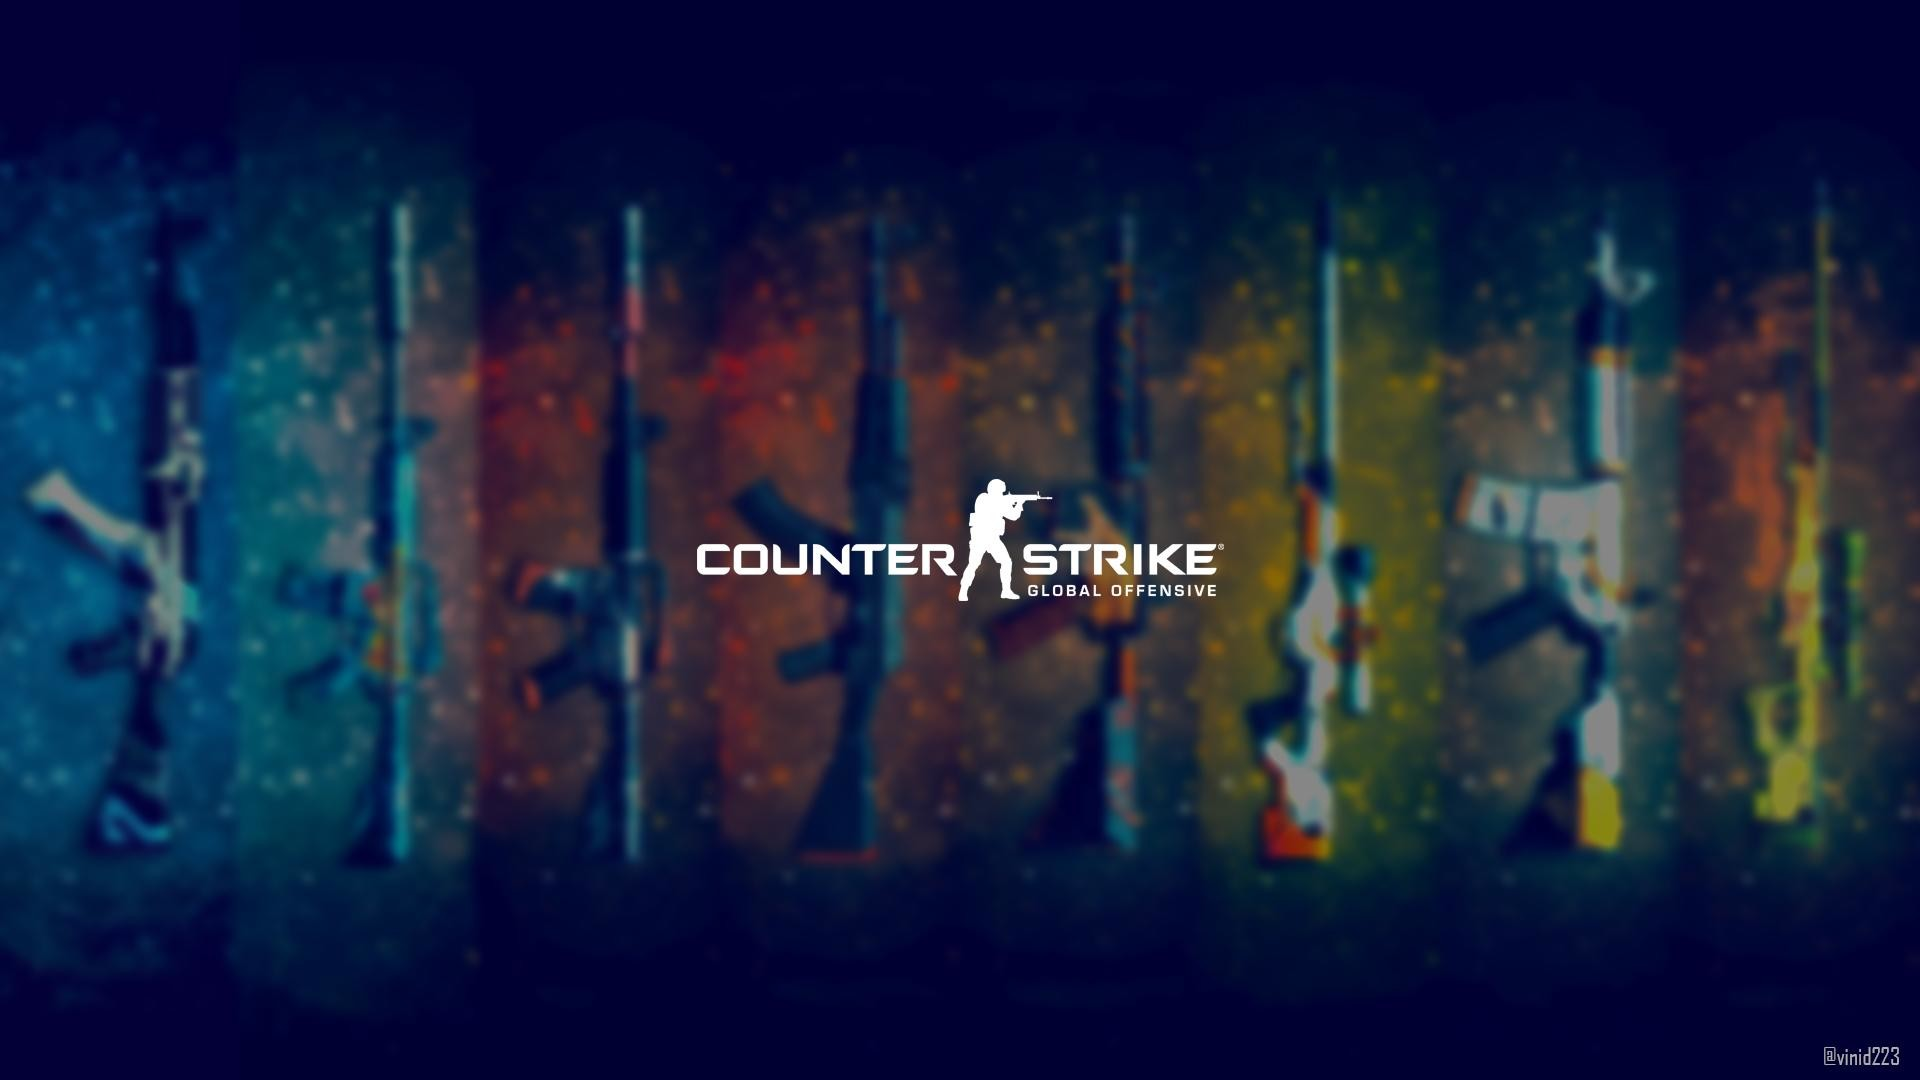 Counter Strike Global Offensive wallpaper